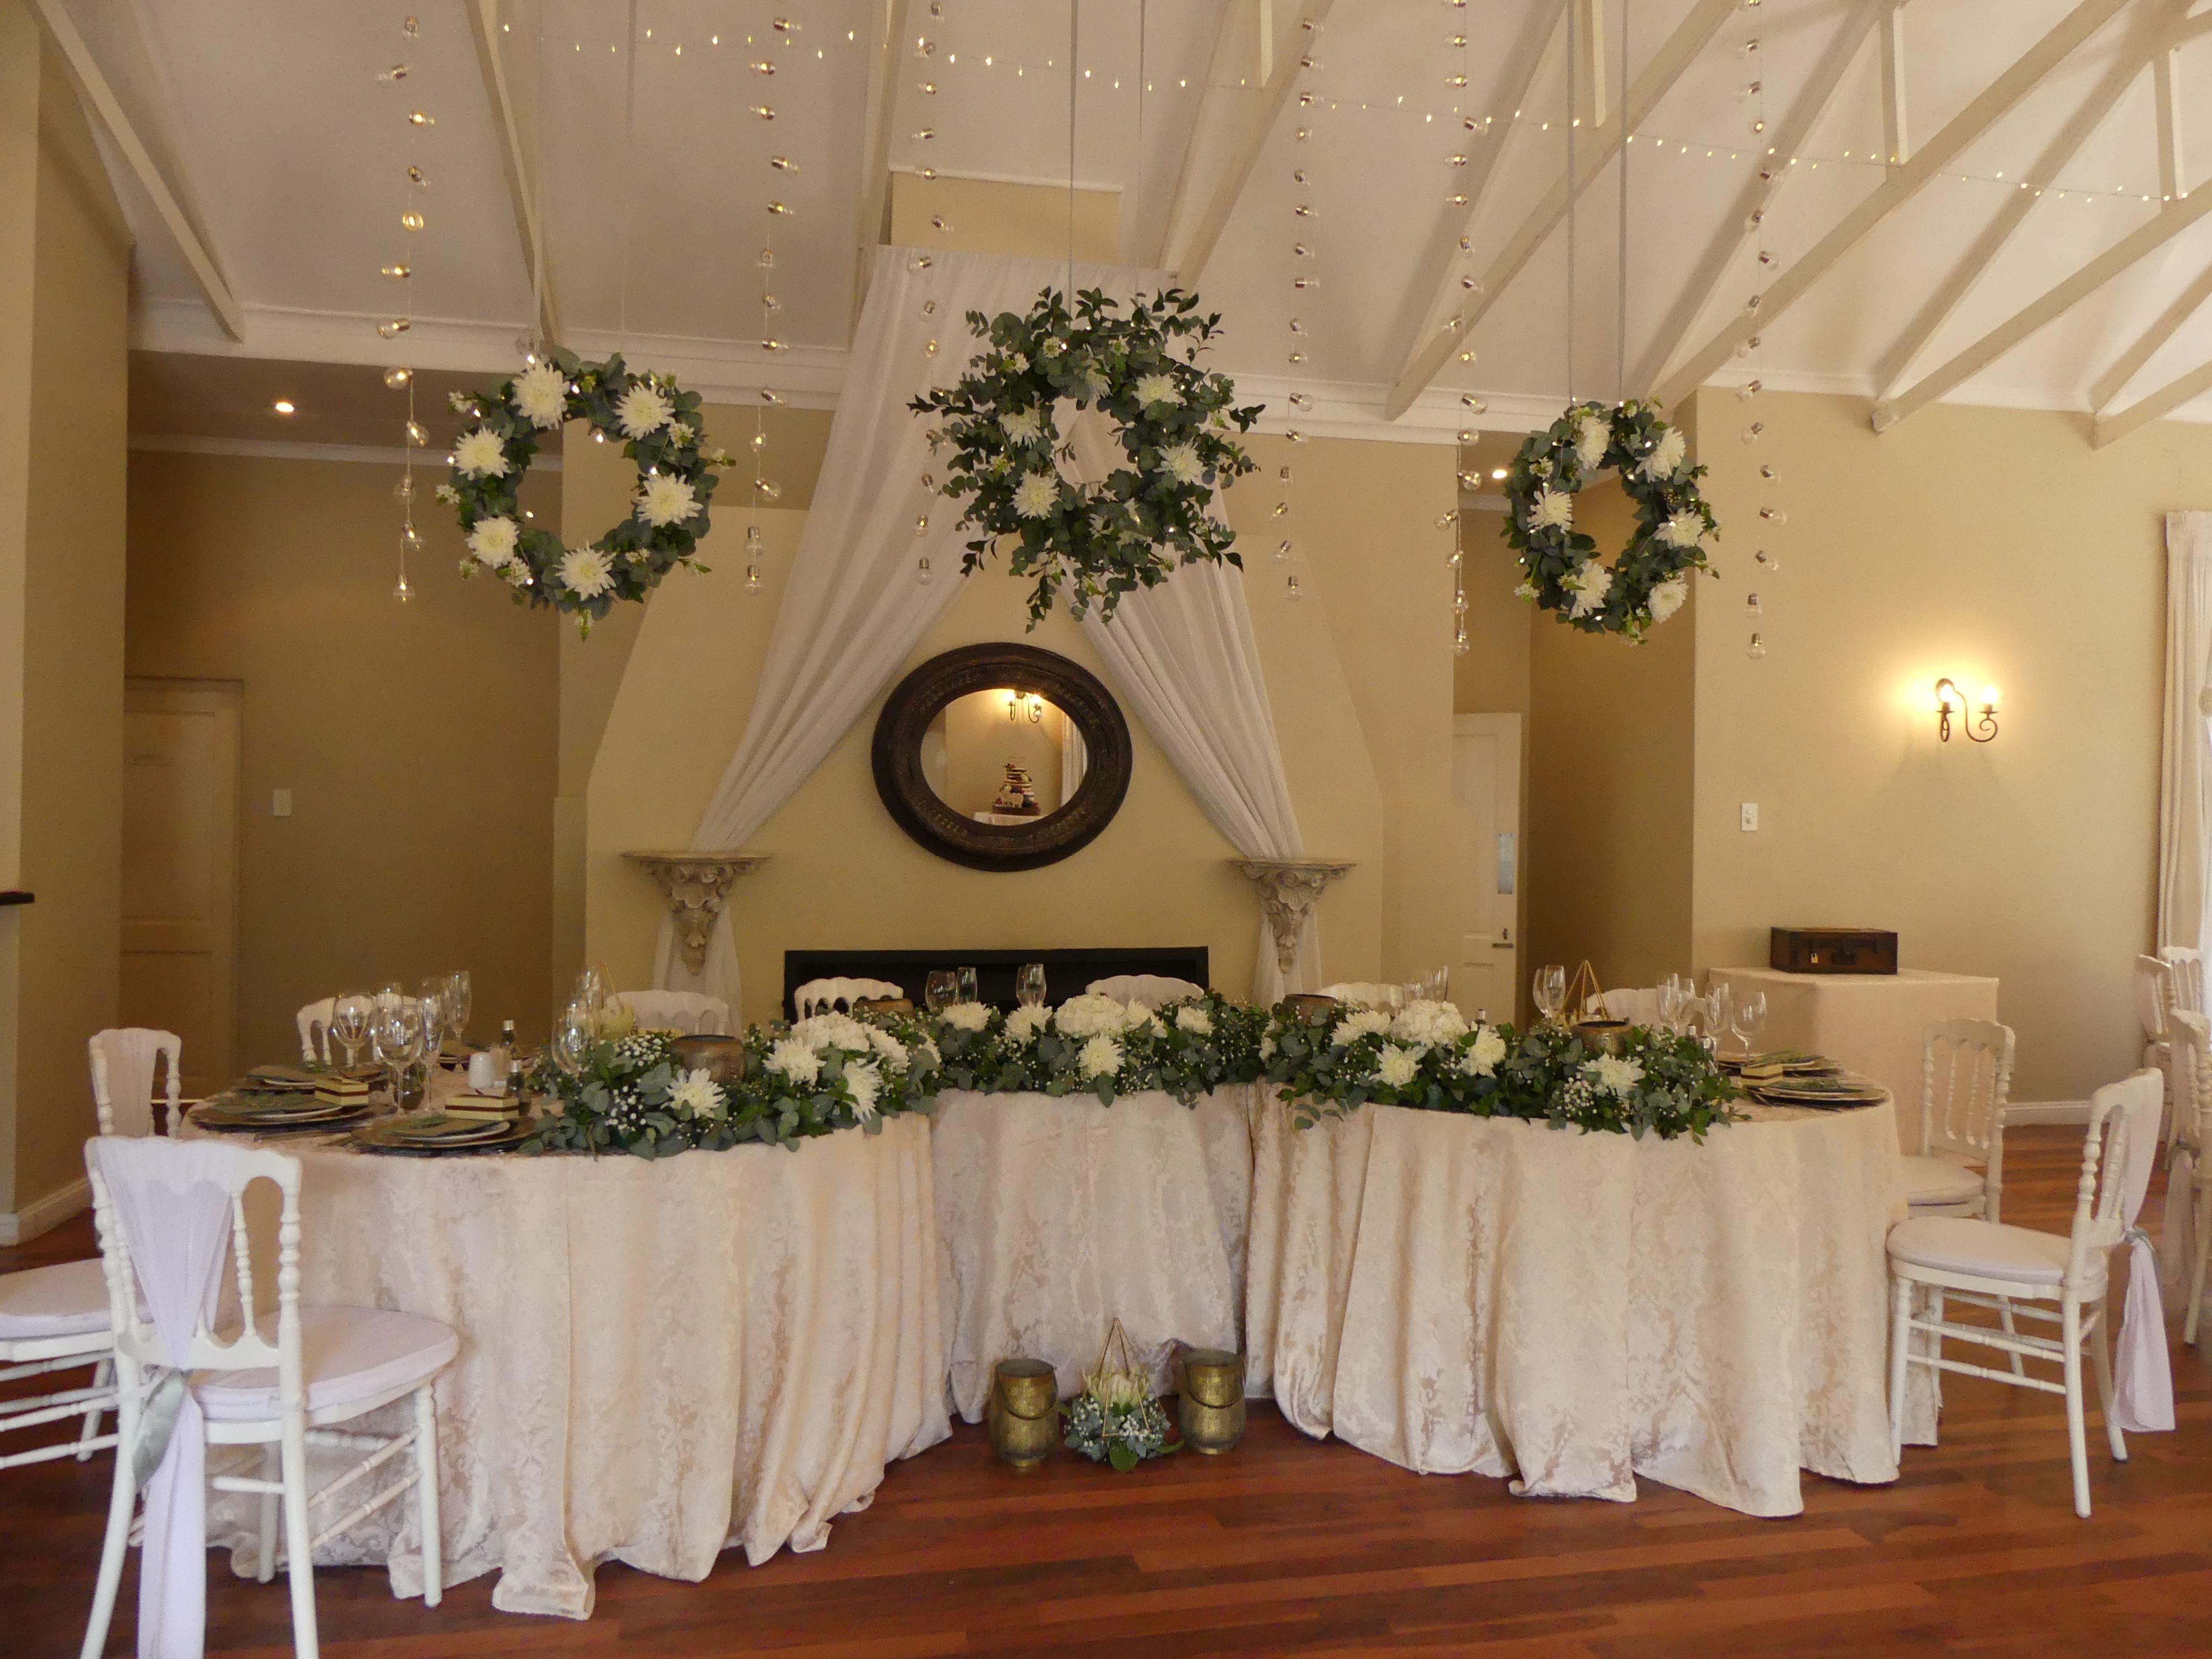 Beautiful Head Table Dressed With Greenery #Weddings #Weddingdecor #Portelizabethwedding #Easterncapewedding